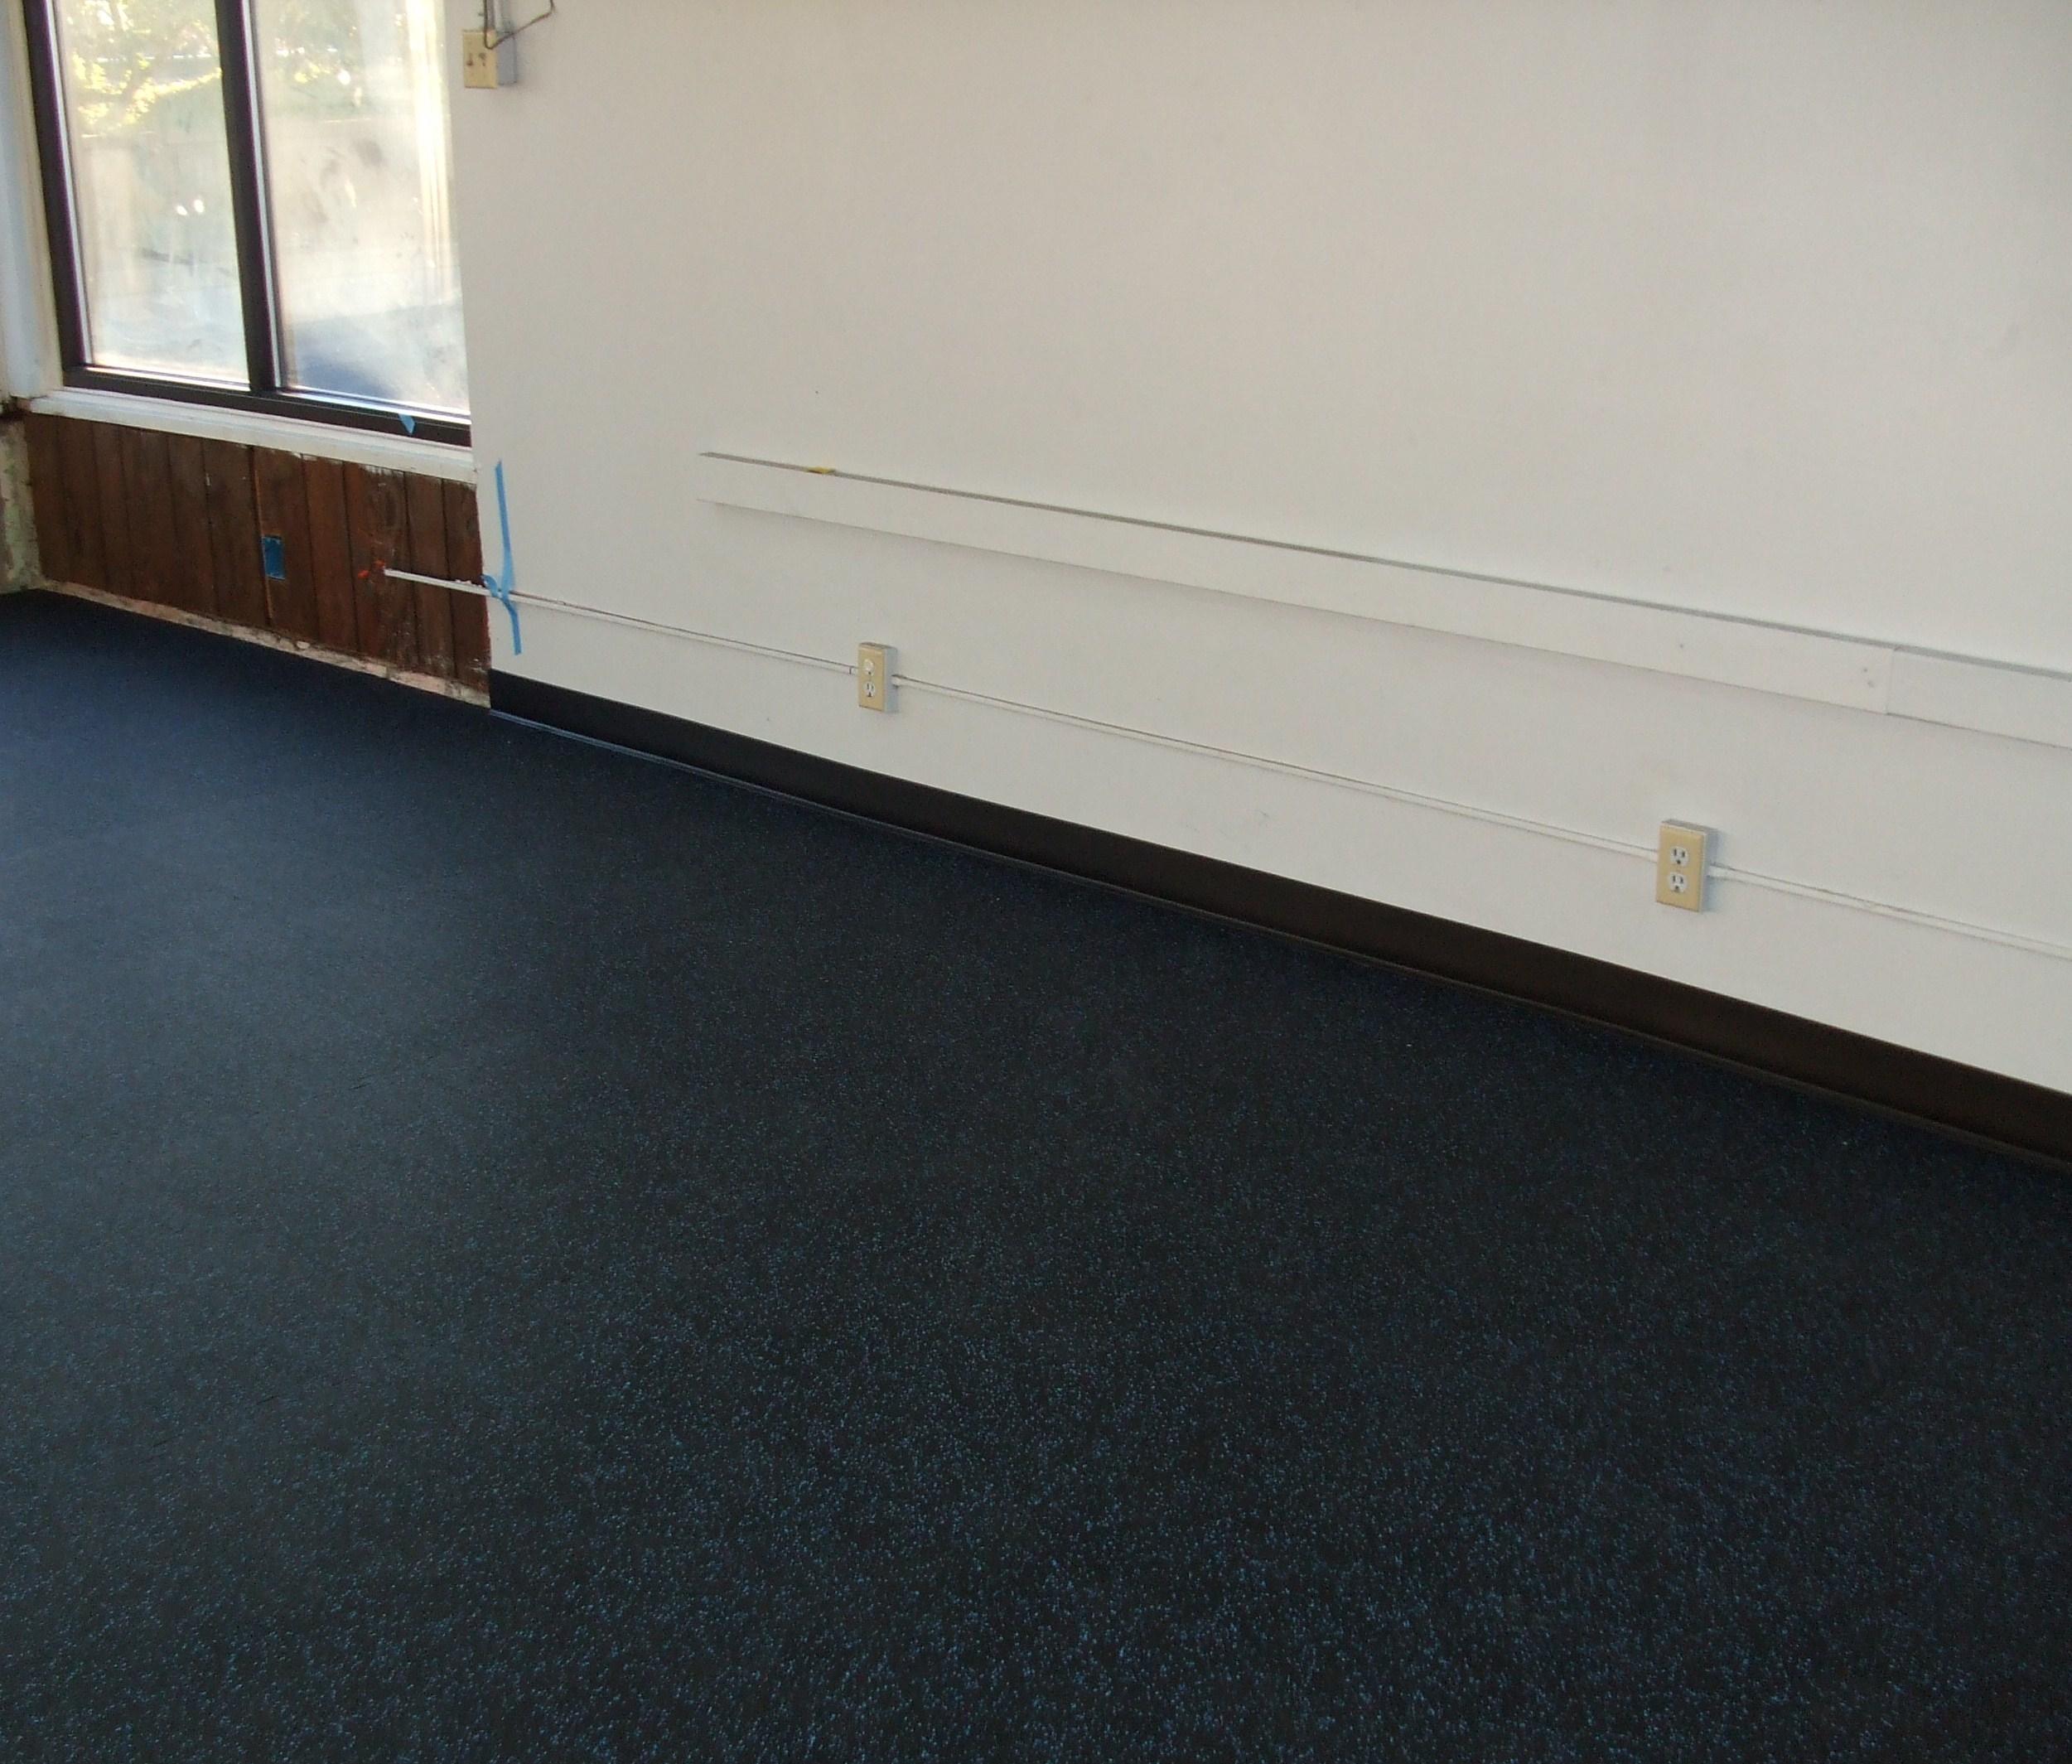 Poured Rubber Floor For Basement